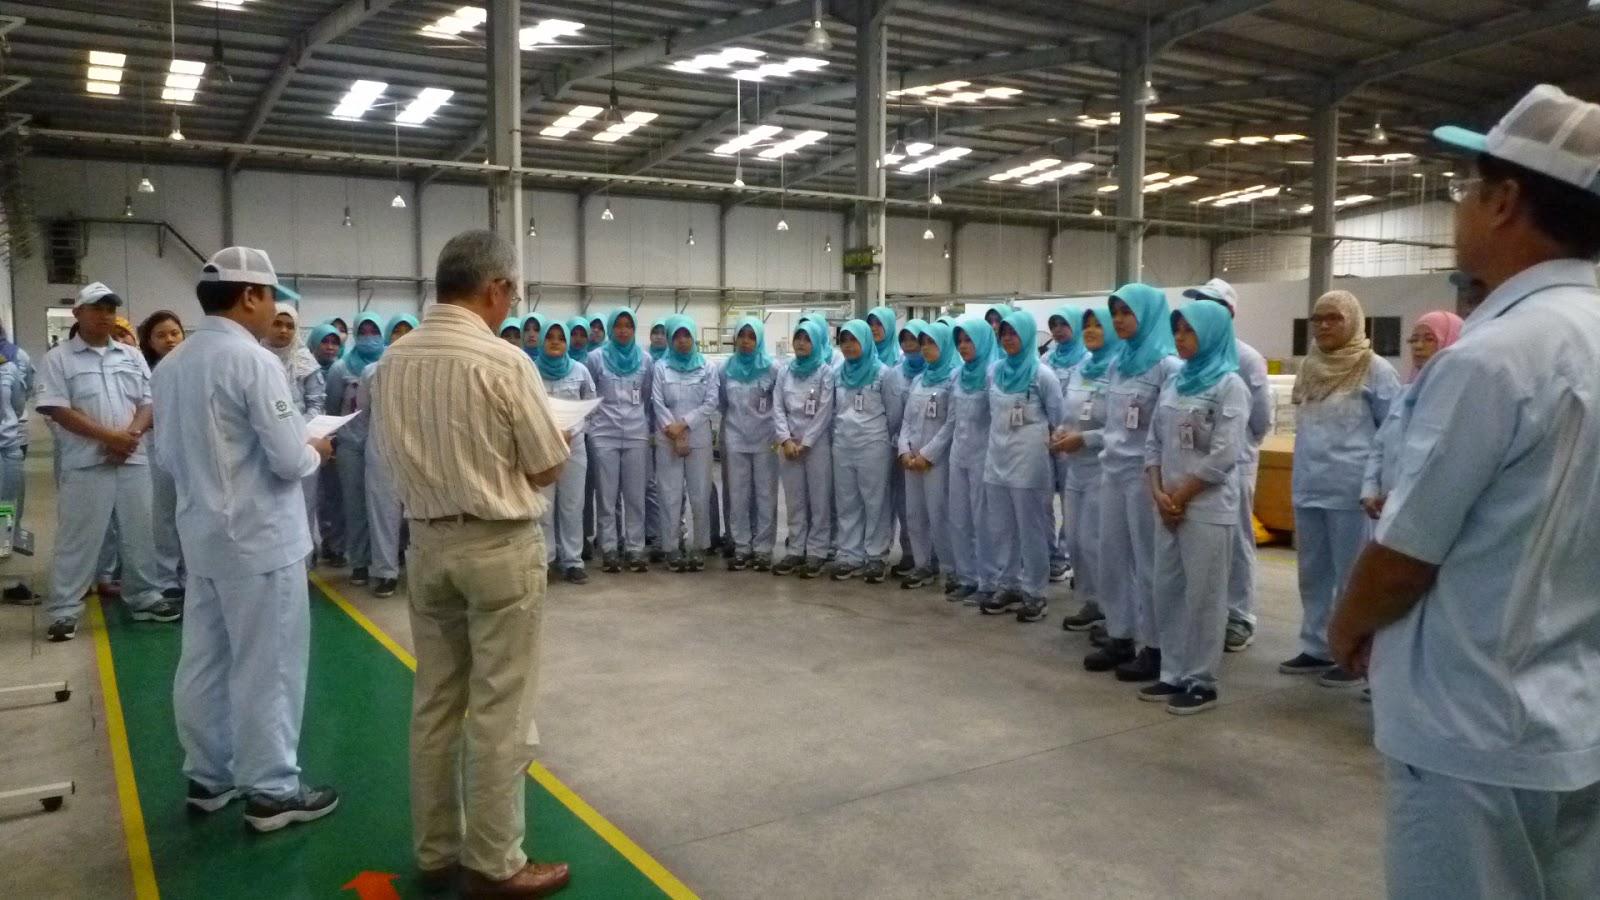 Informasi Loker Kawasan MM2100 Cikarang PT YAMADA INDONESIA Terbaru